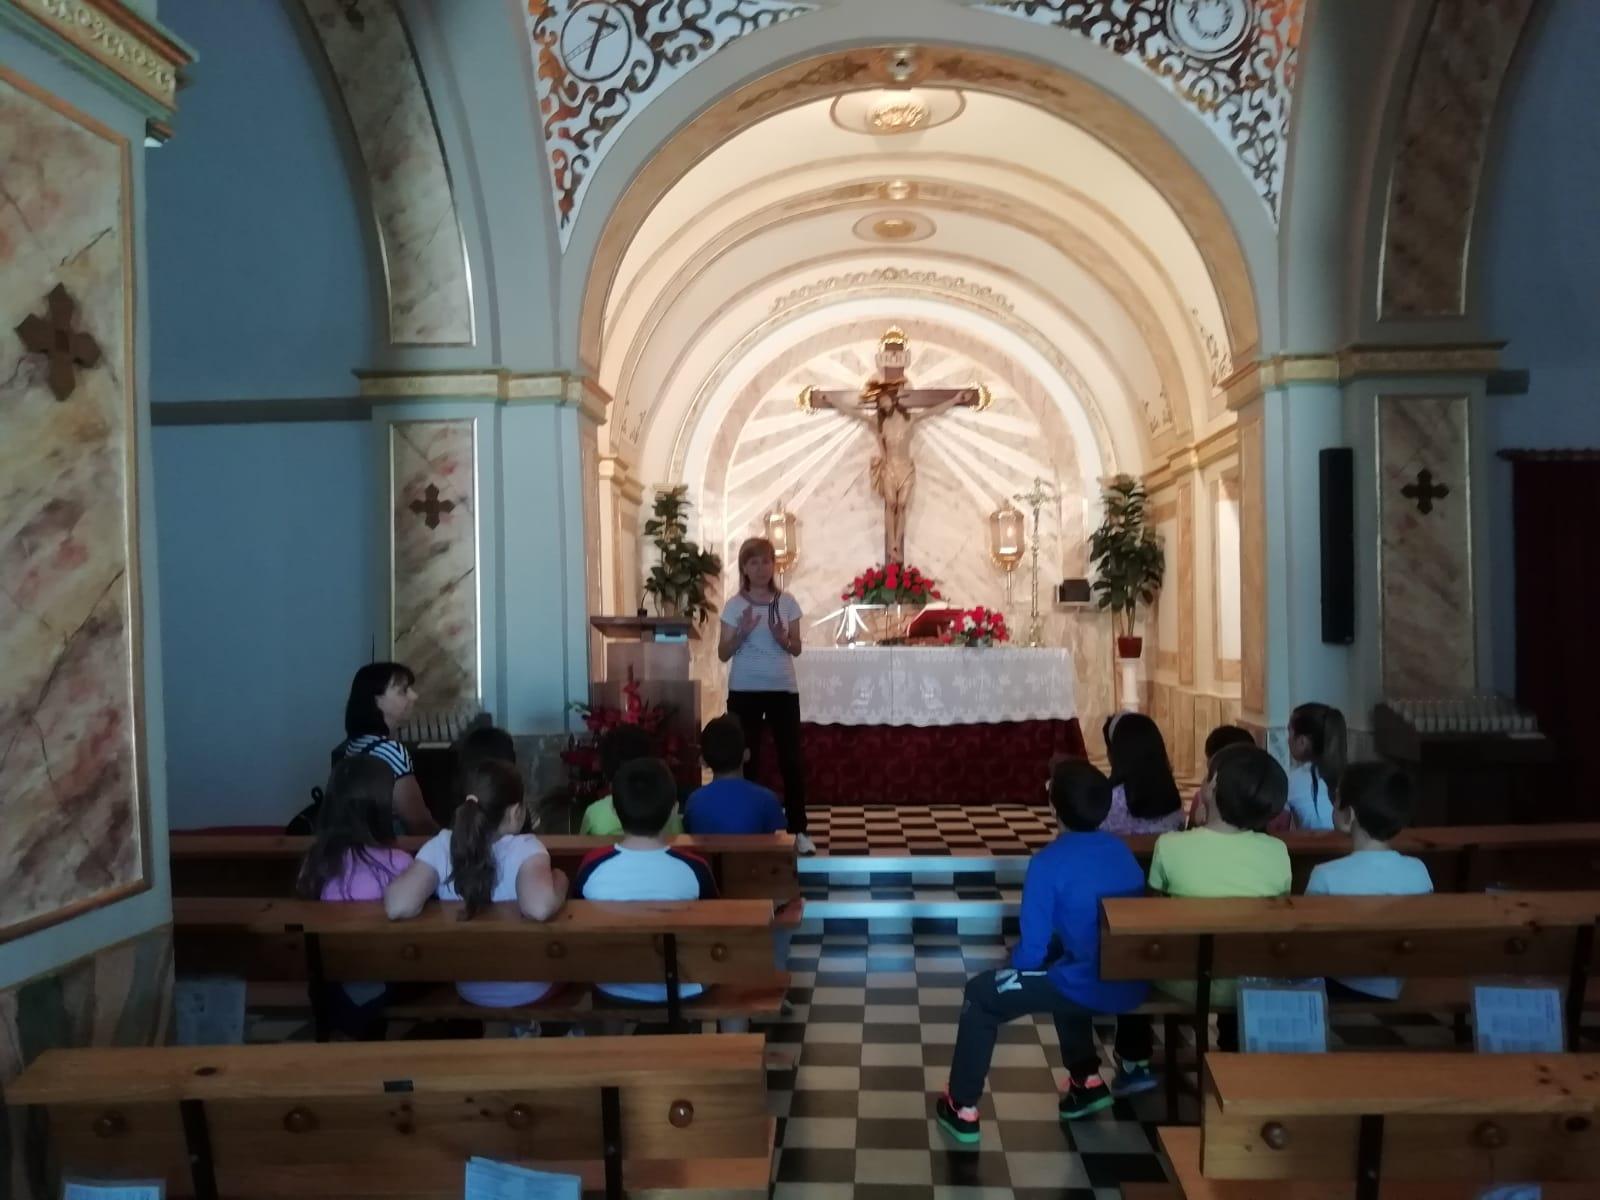 (2019-05-23) Visita ermita alumnos Laura - 3 C primaria - Reina Sofia - María Isabel Berenguer (04)